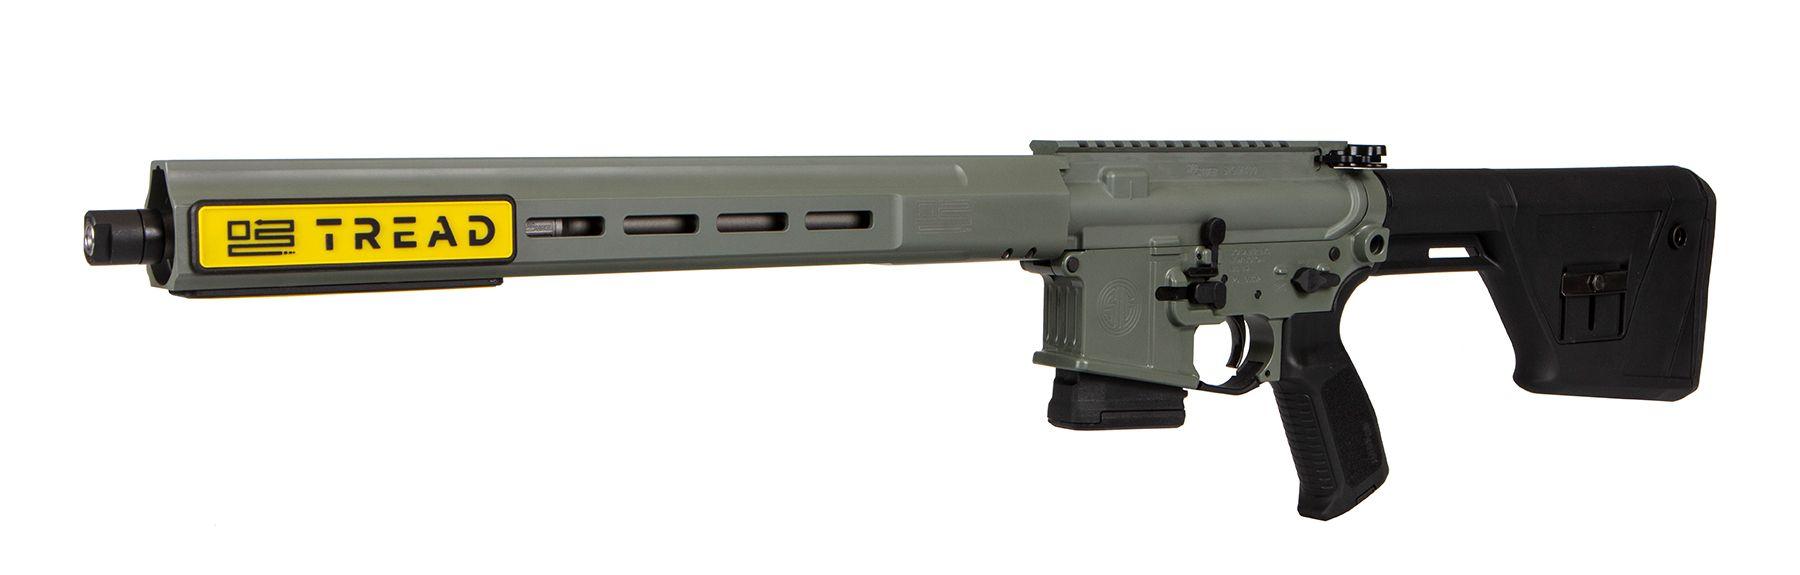 sig sauer sigm400 tread predator rifle